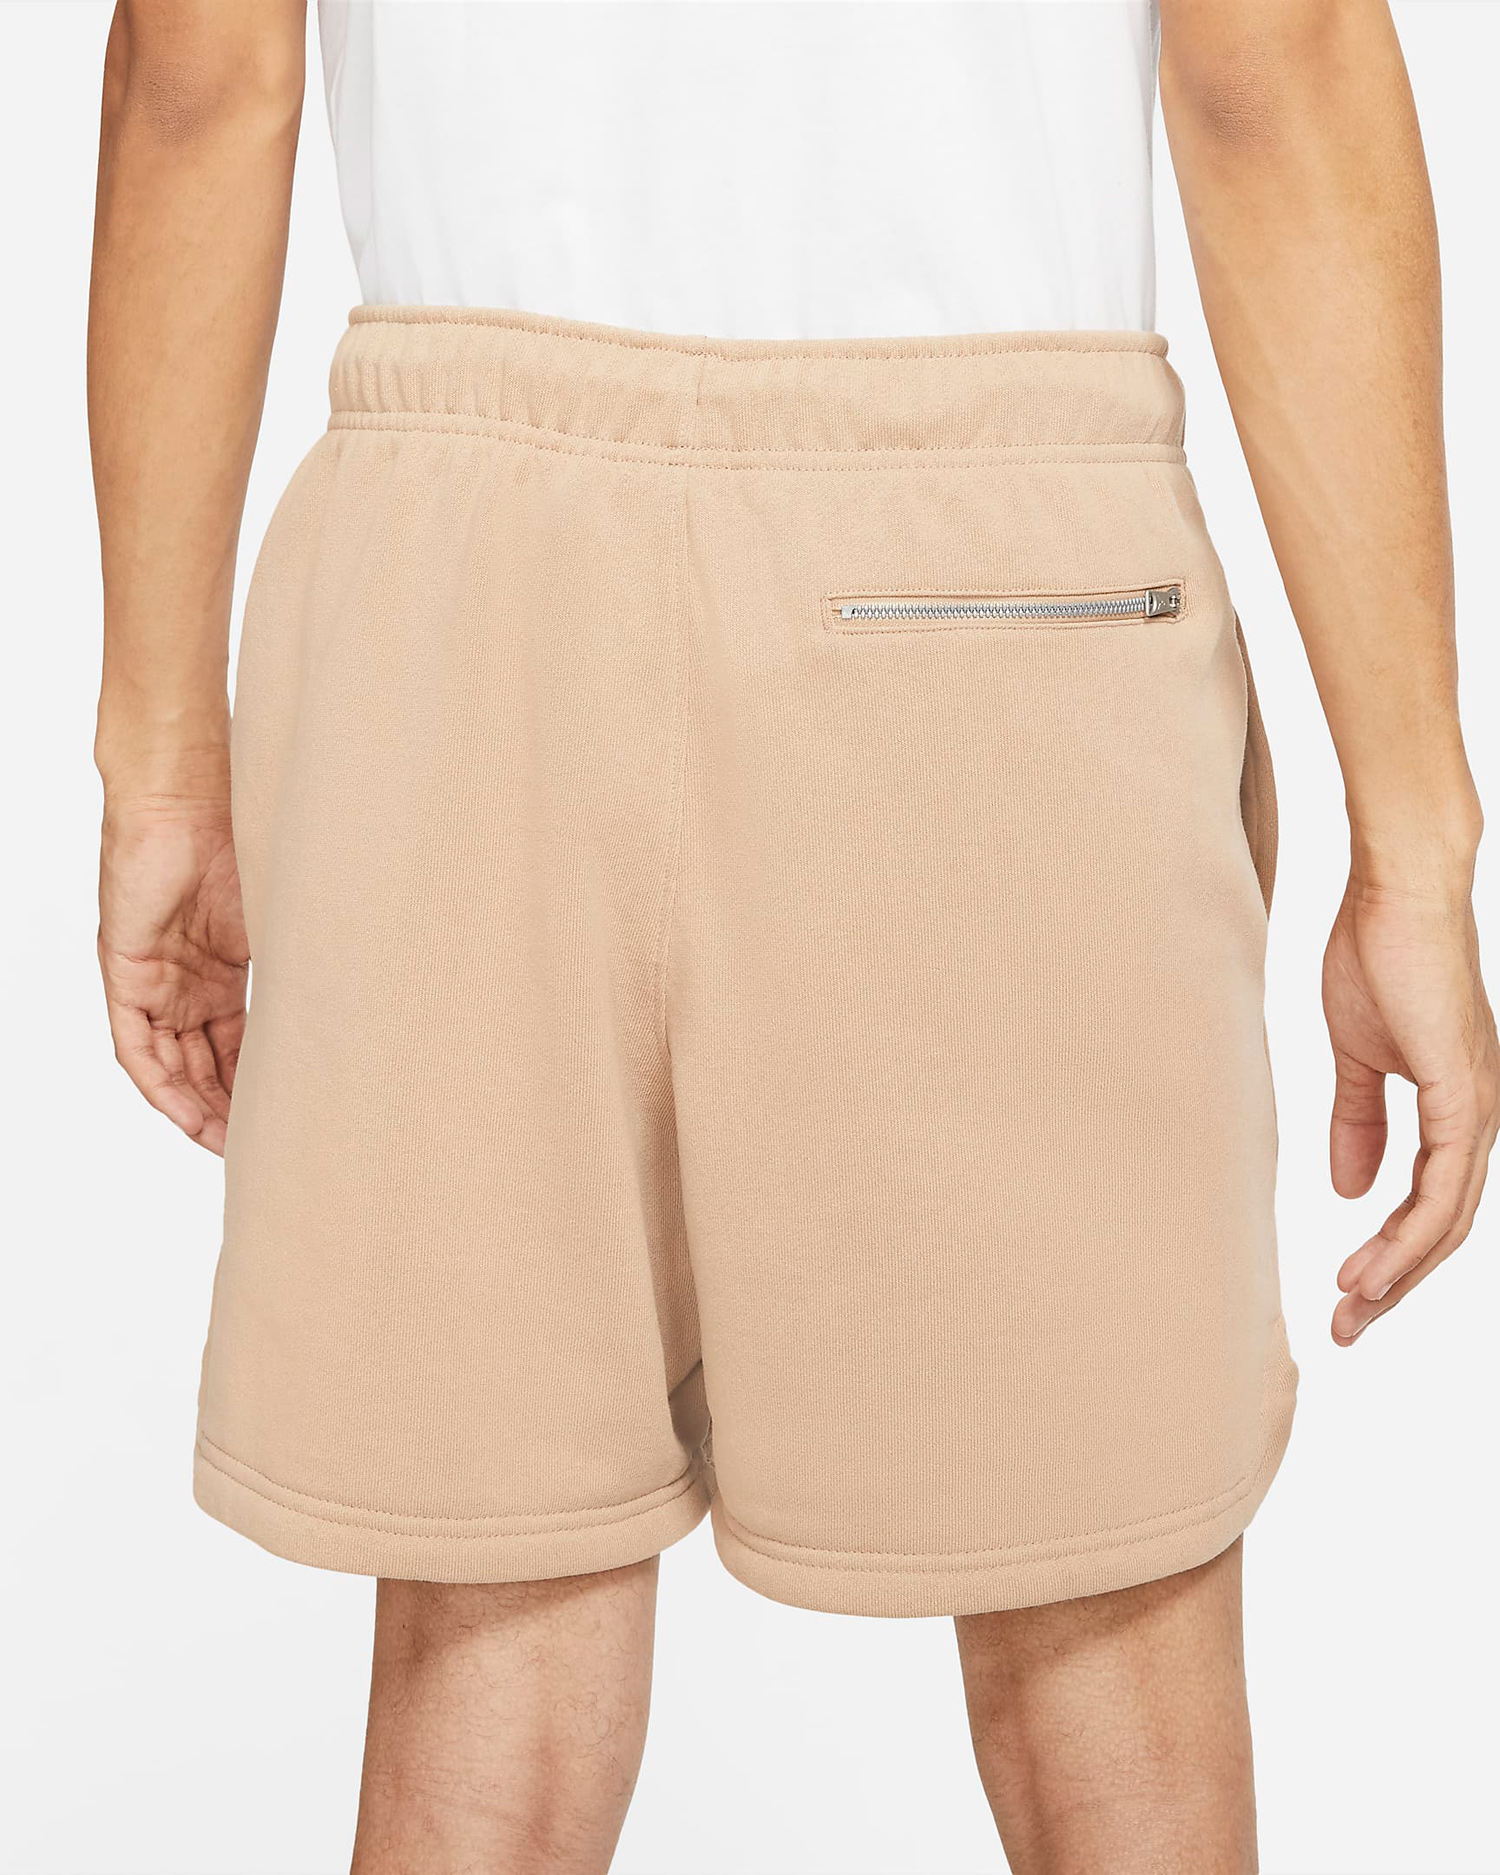 jordan-hemp-essentials-fleece-shorts-4